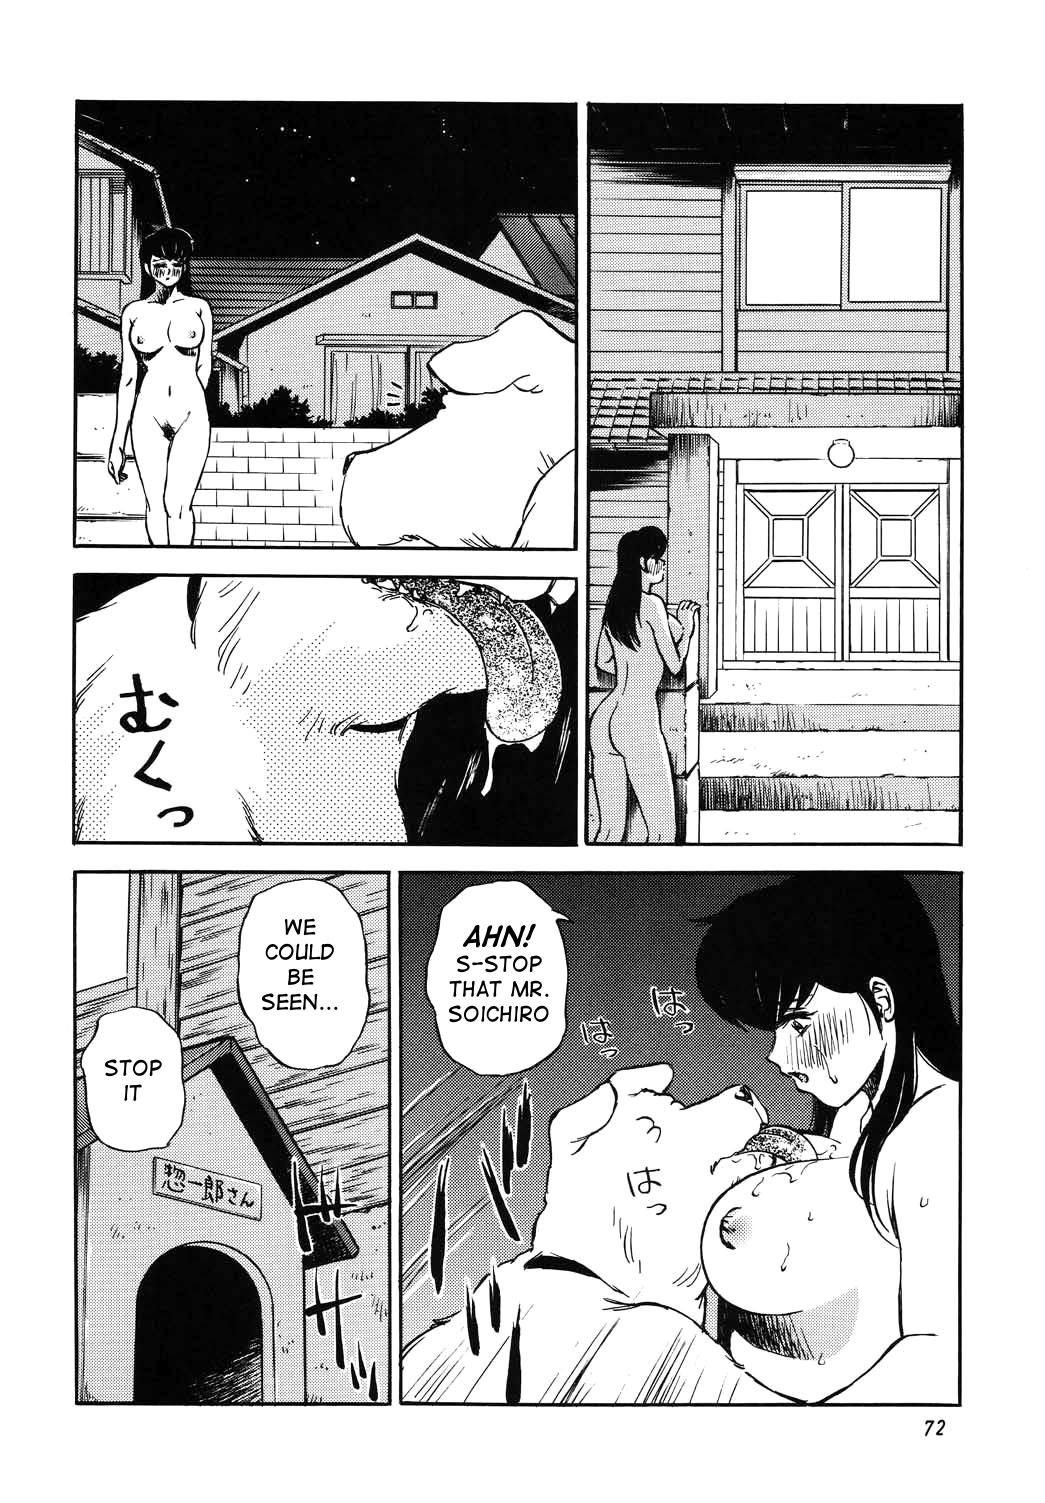 (C64) [Rippadou (COLIN)] Tobira no Mae -on the wane- | Infront of the Door (ROUTE 106) (Maison Ikkoku) [English] [q91] 13